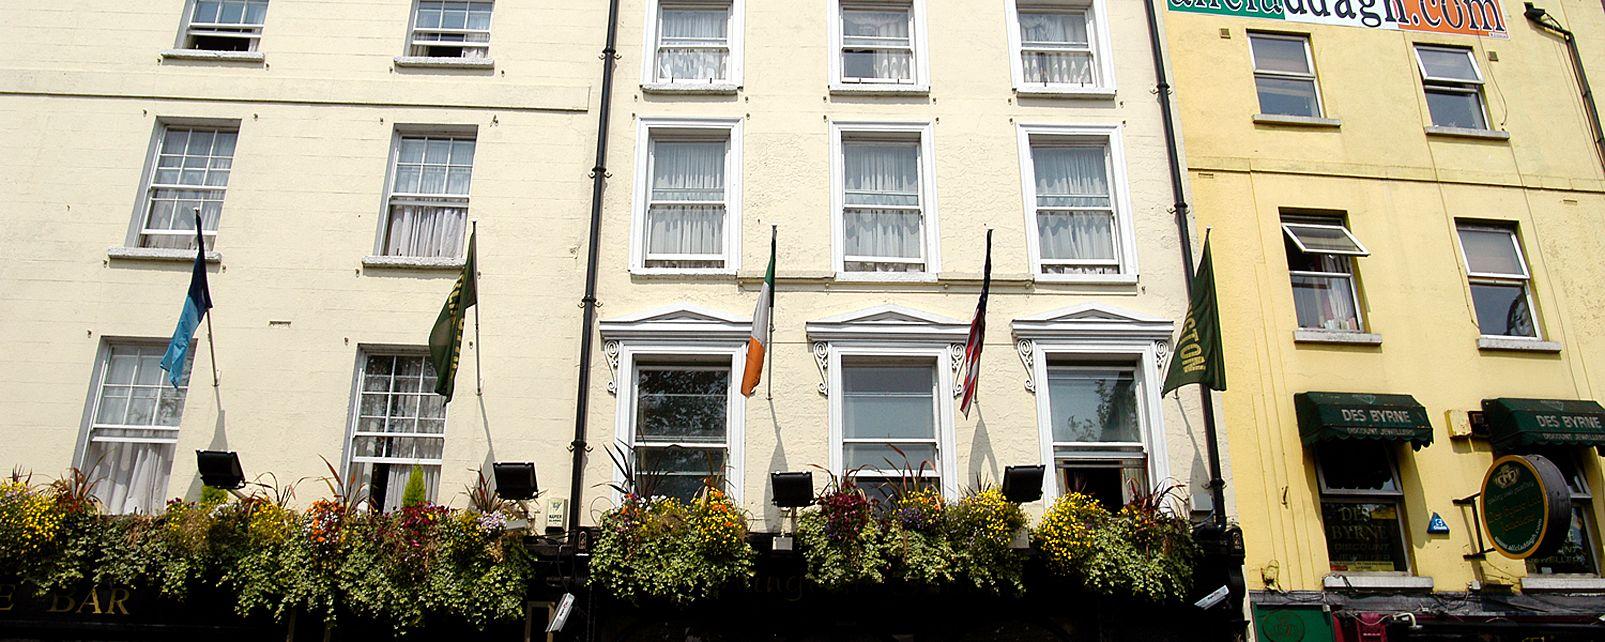 Hotel The Arlington, O'Connell Bridge